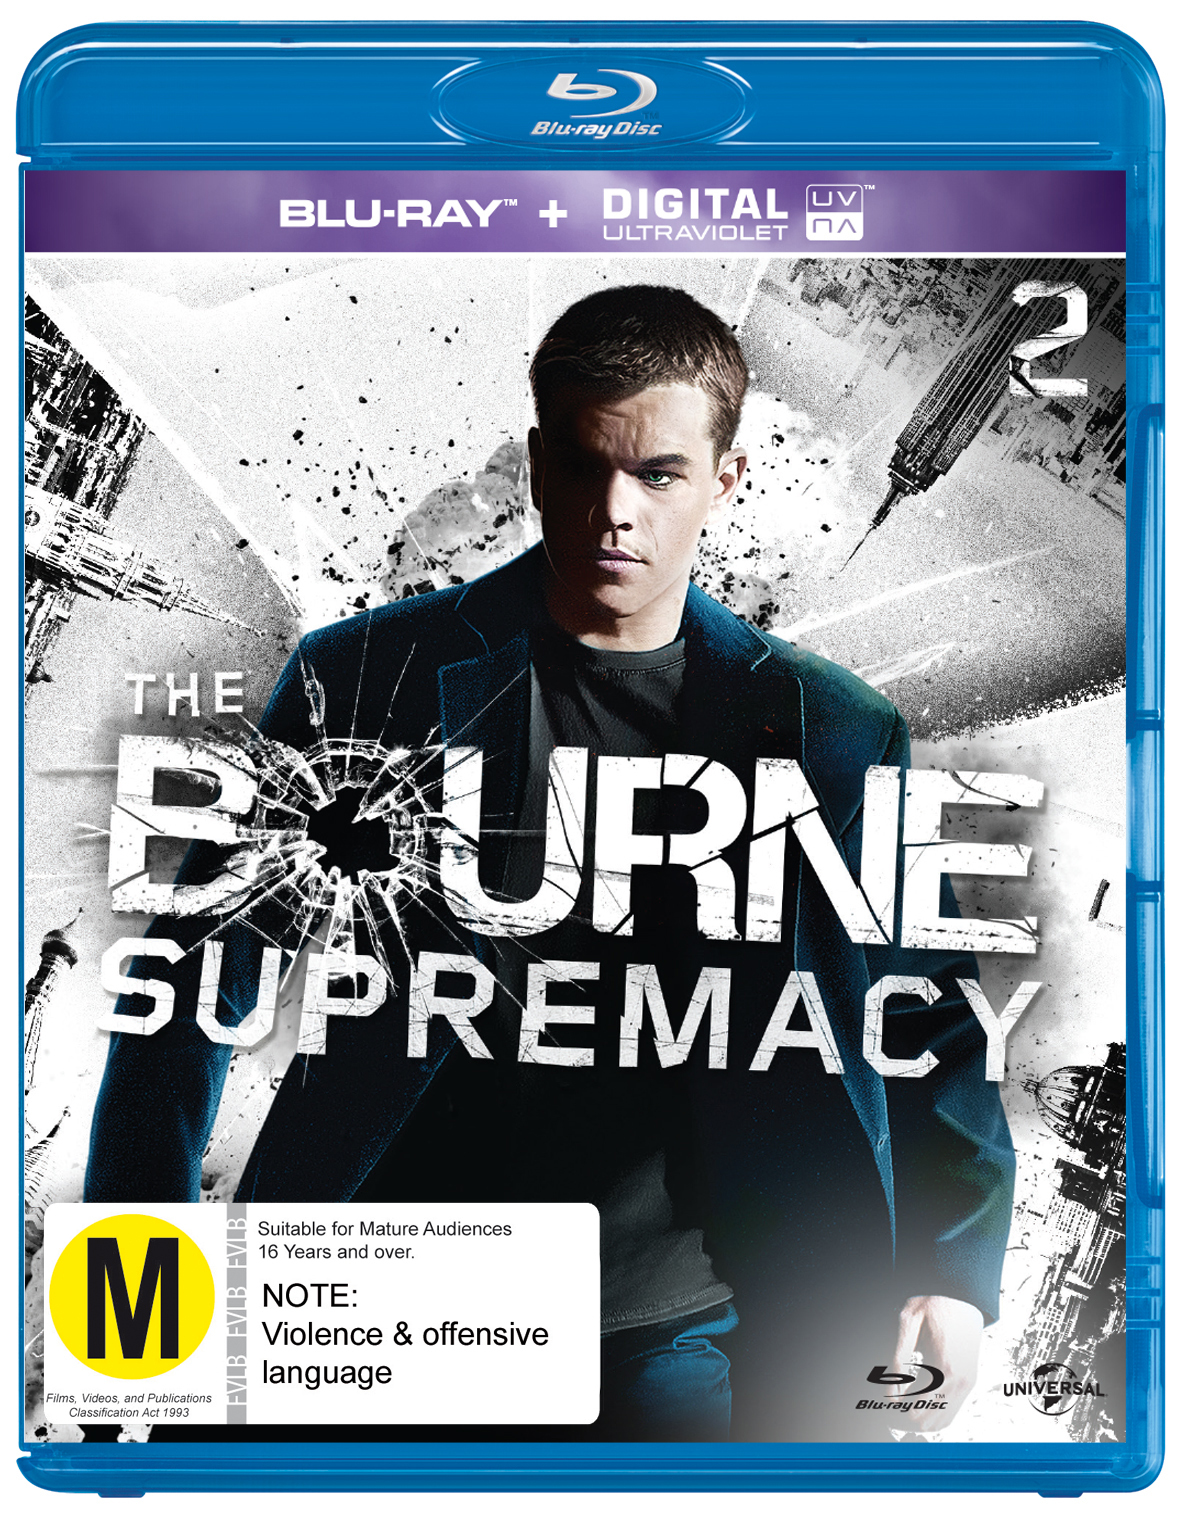 The Bourne Supremacy on Blu-ray image